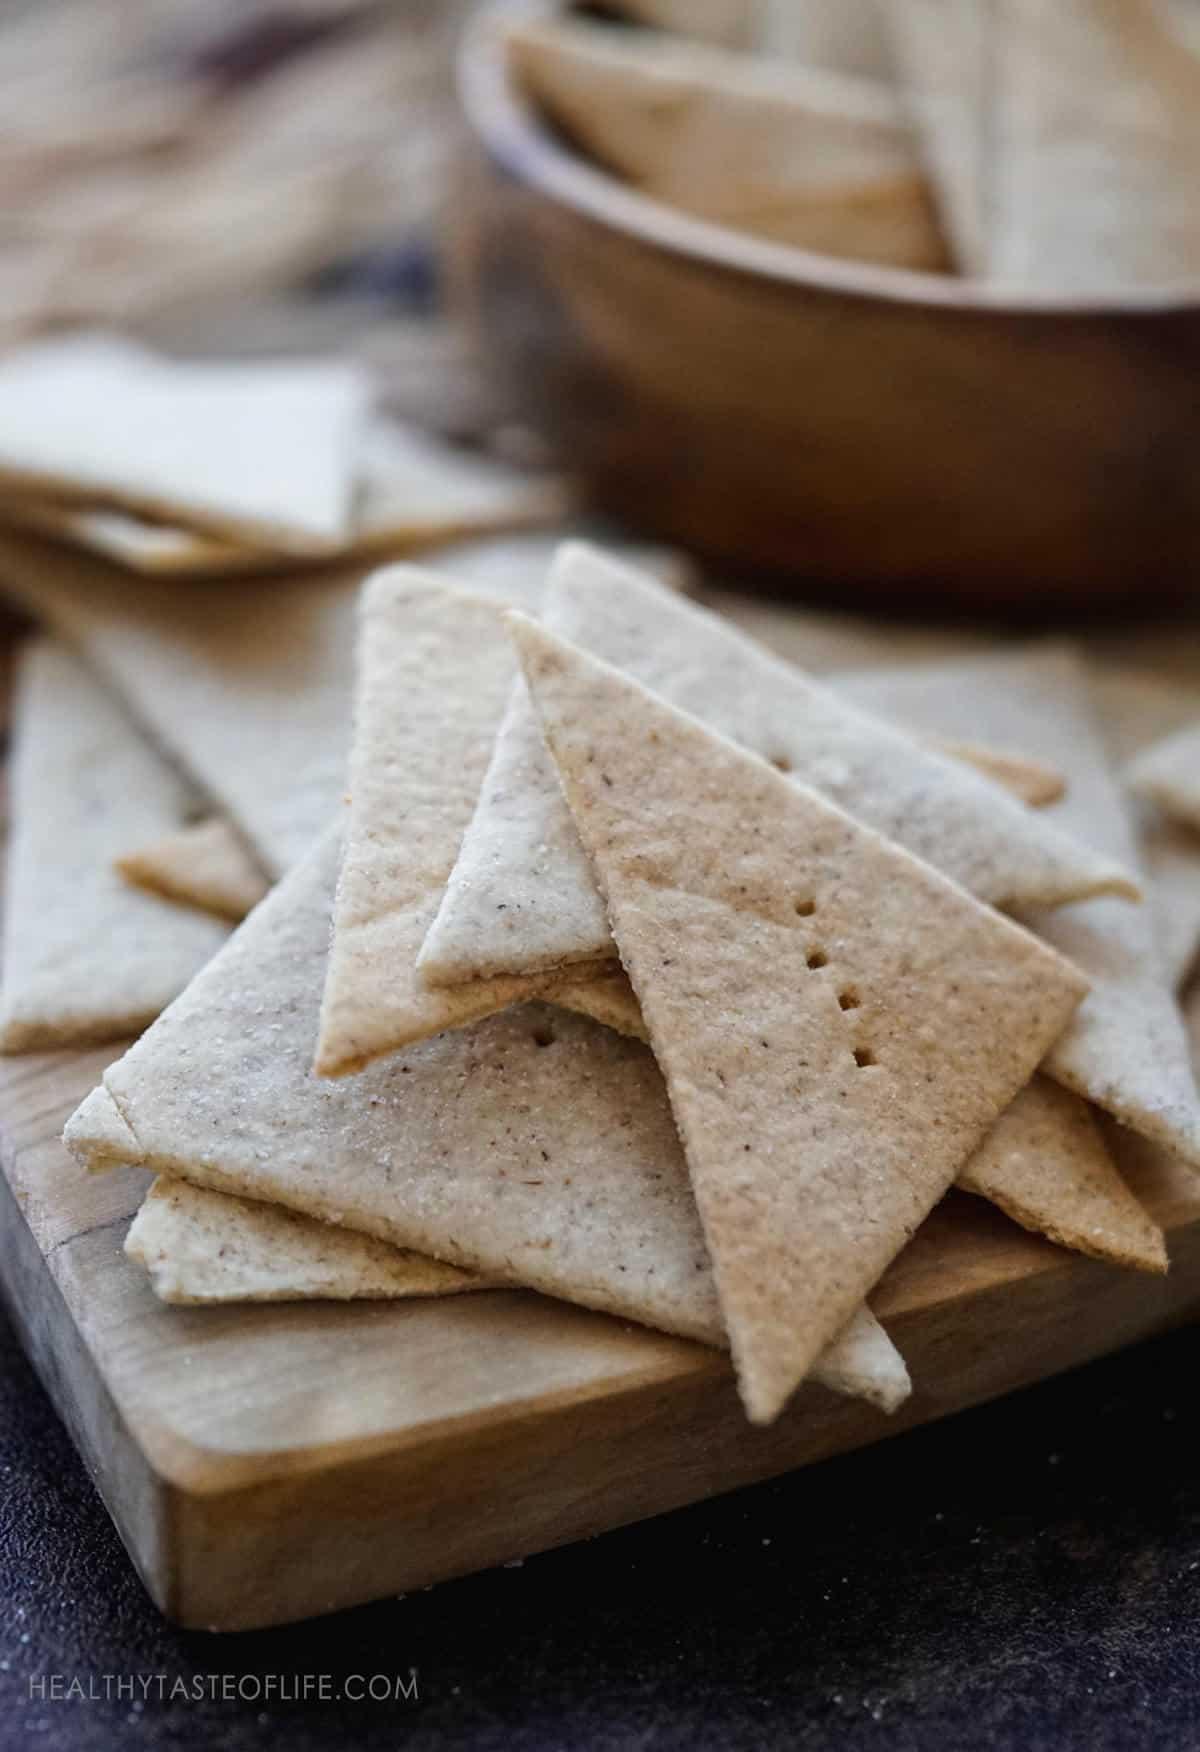 Grain free cassava crackers on a wood board.